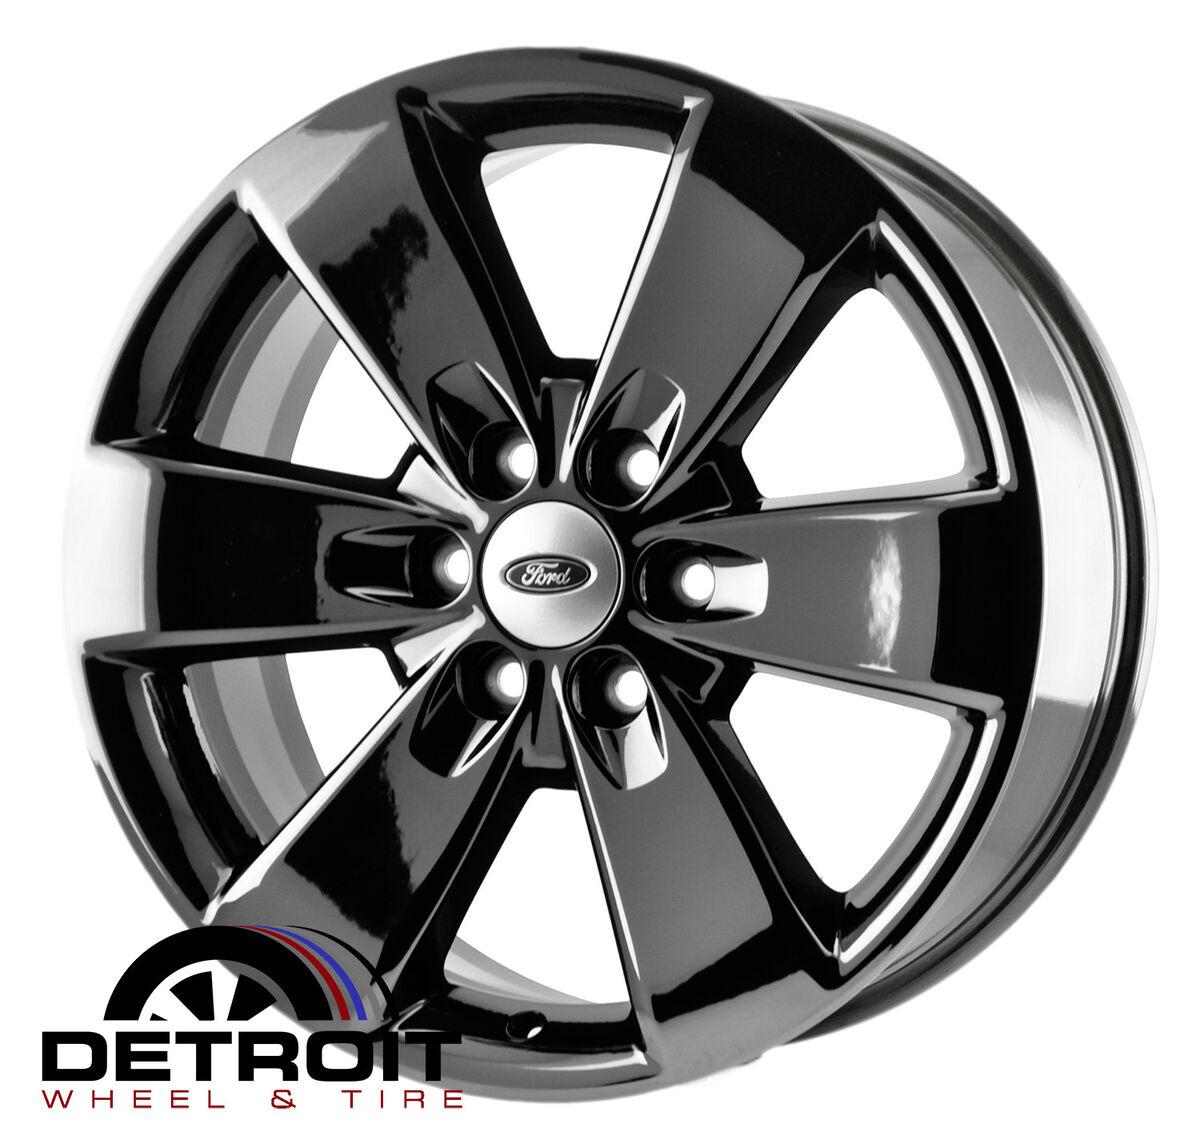 Ford F150 PVD Black Chrome Wheels Factory Rim 3833 Exchange 2010 2014